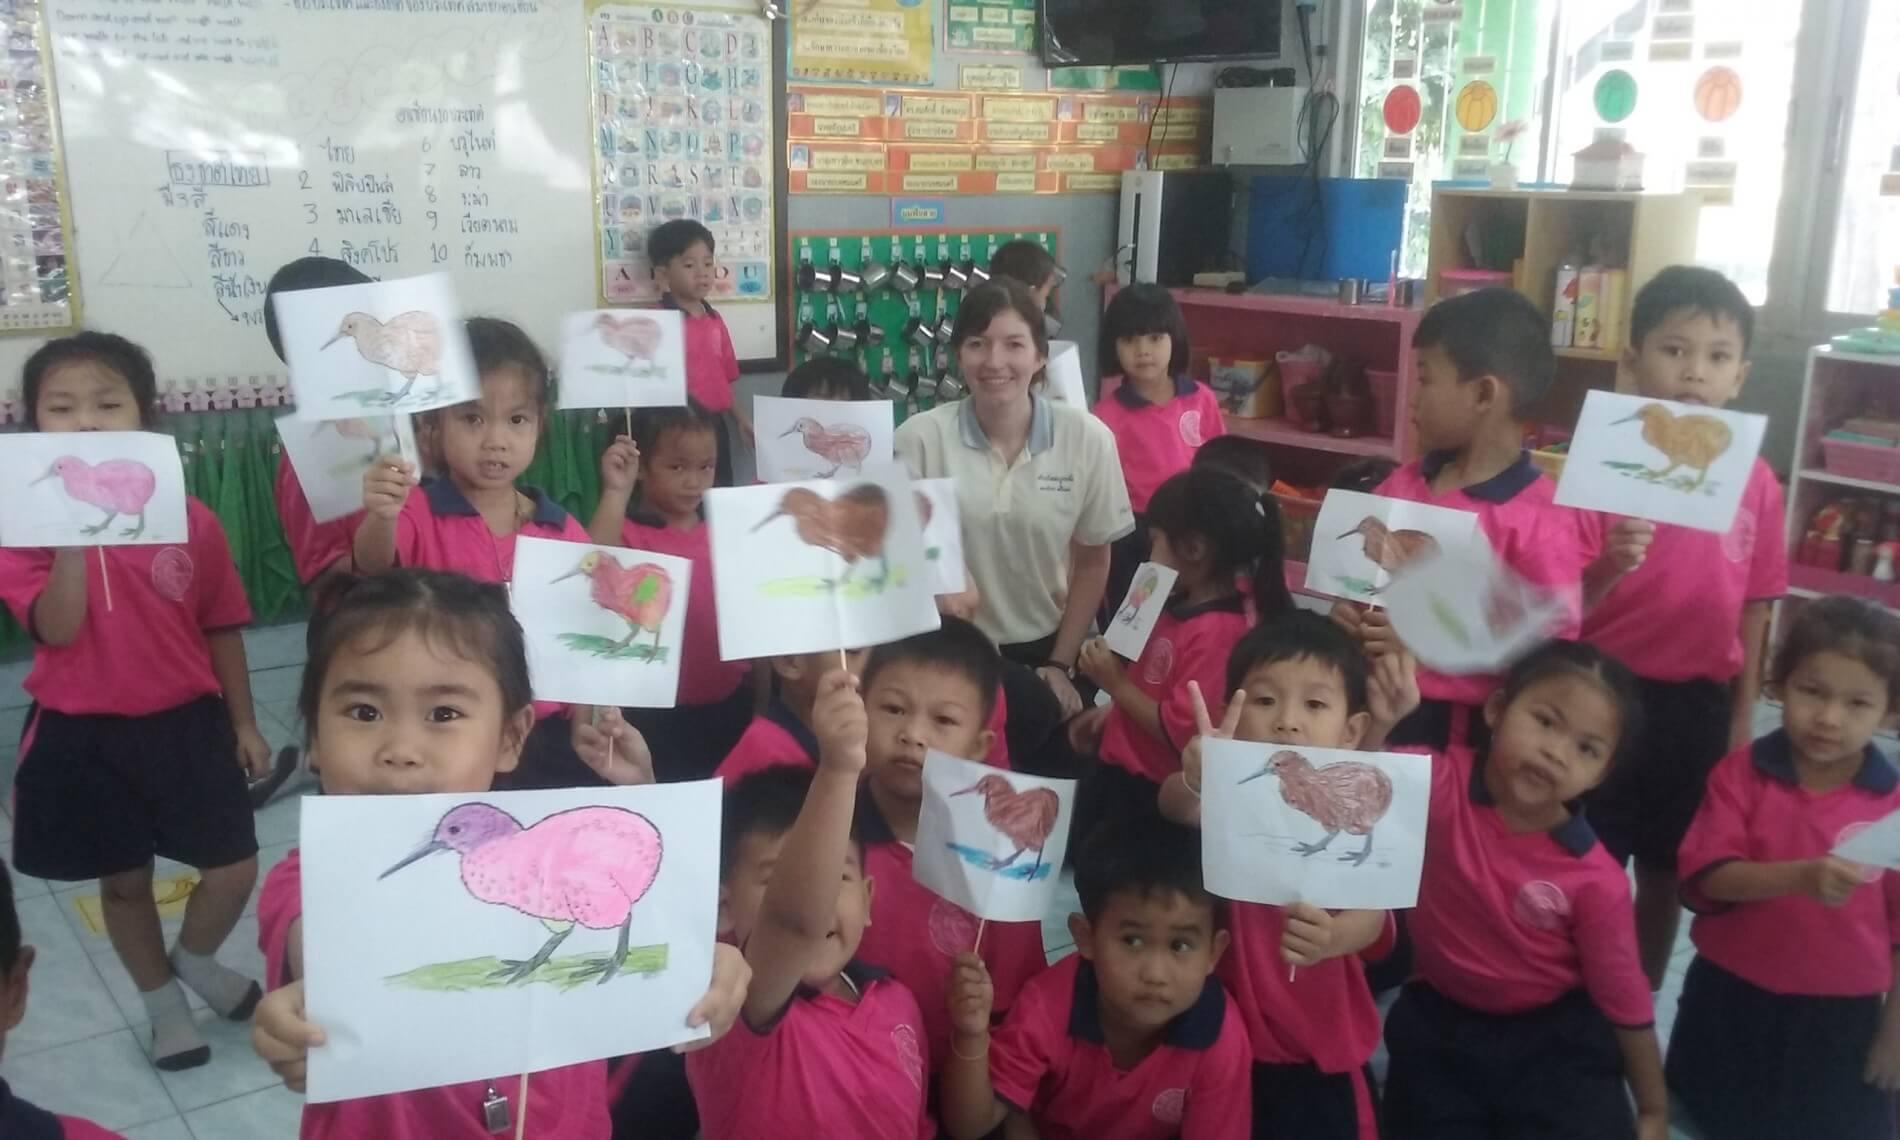 My class in Thailand